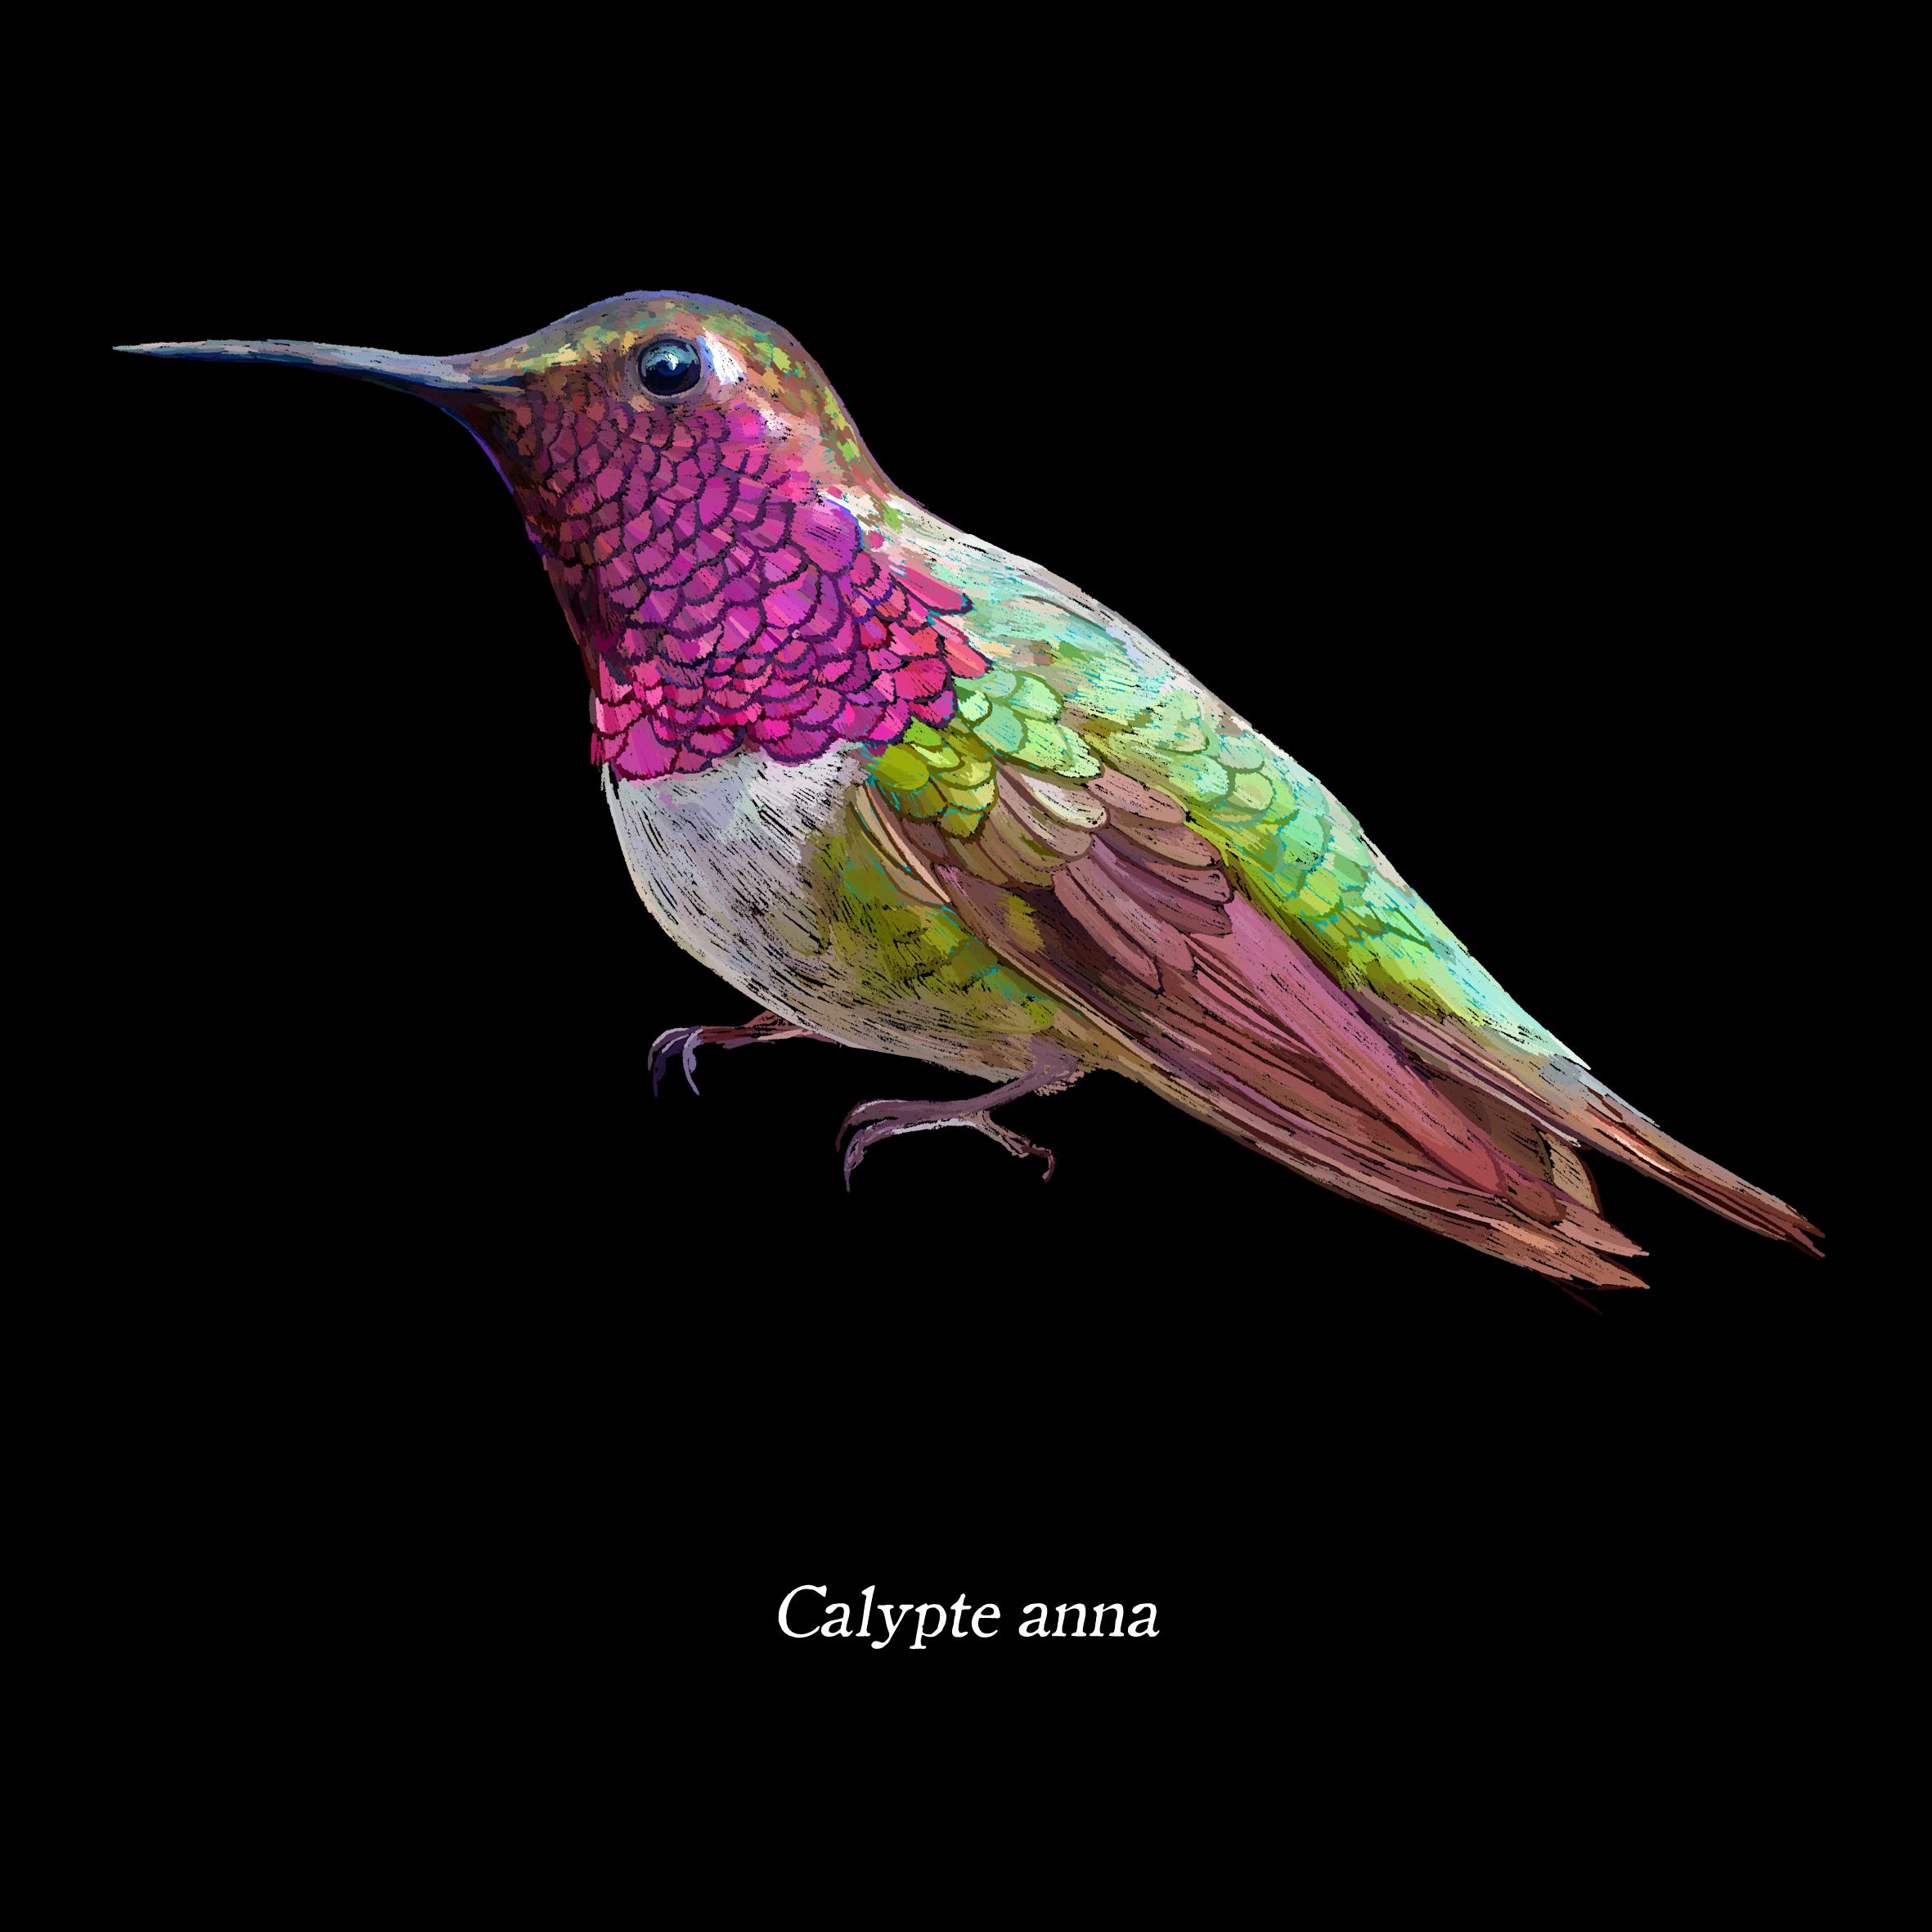 Calypte anna